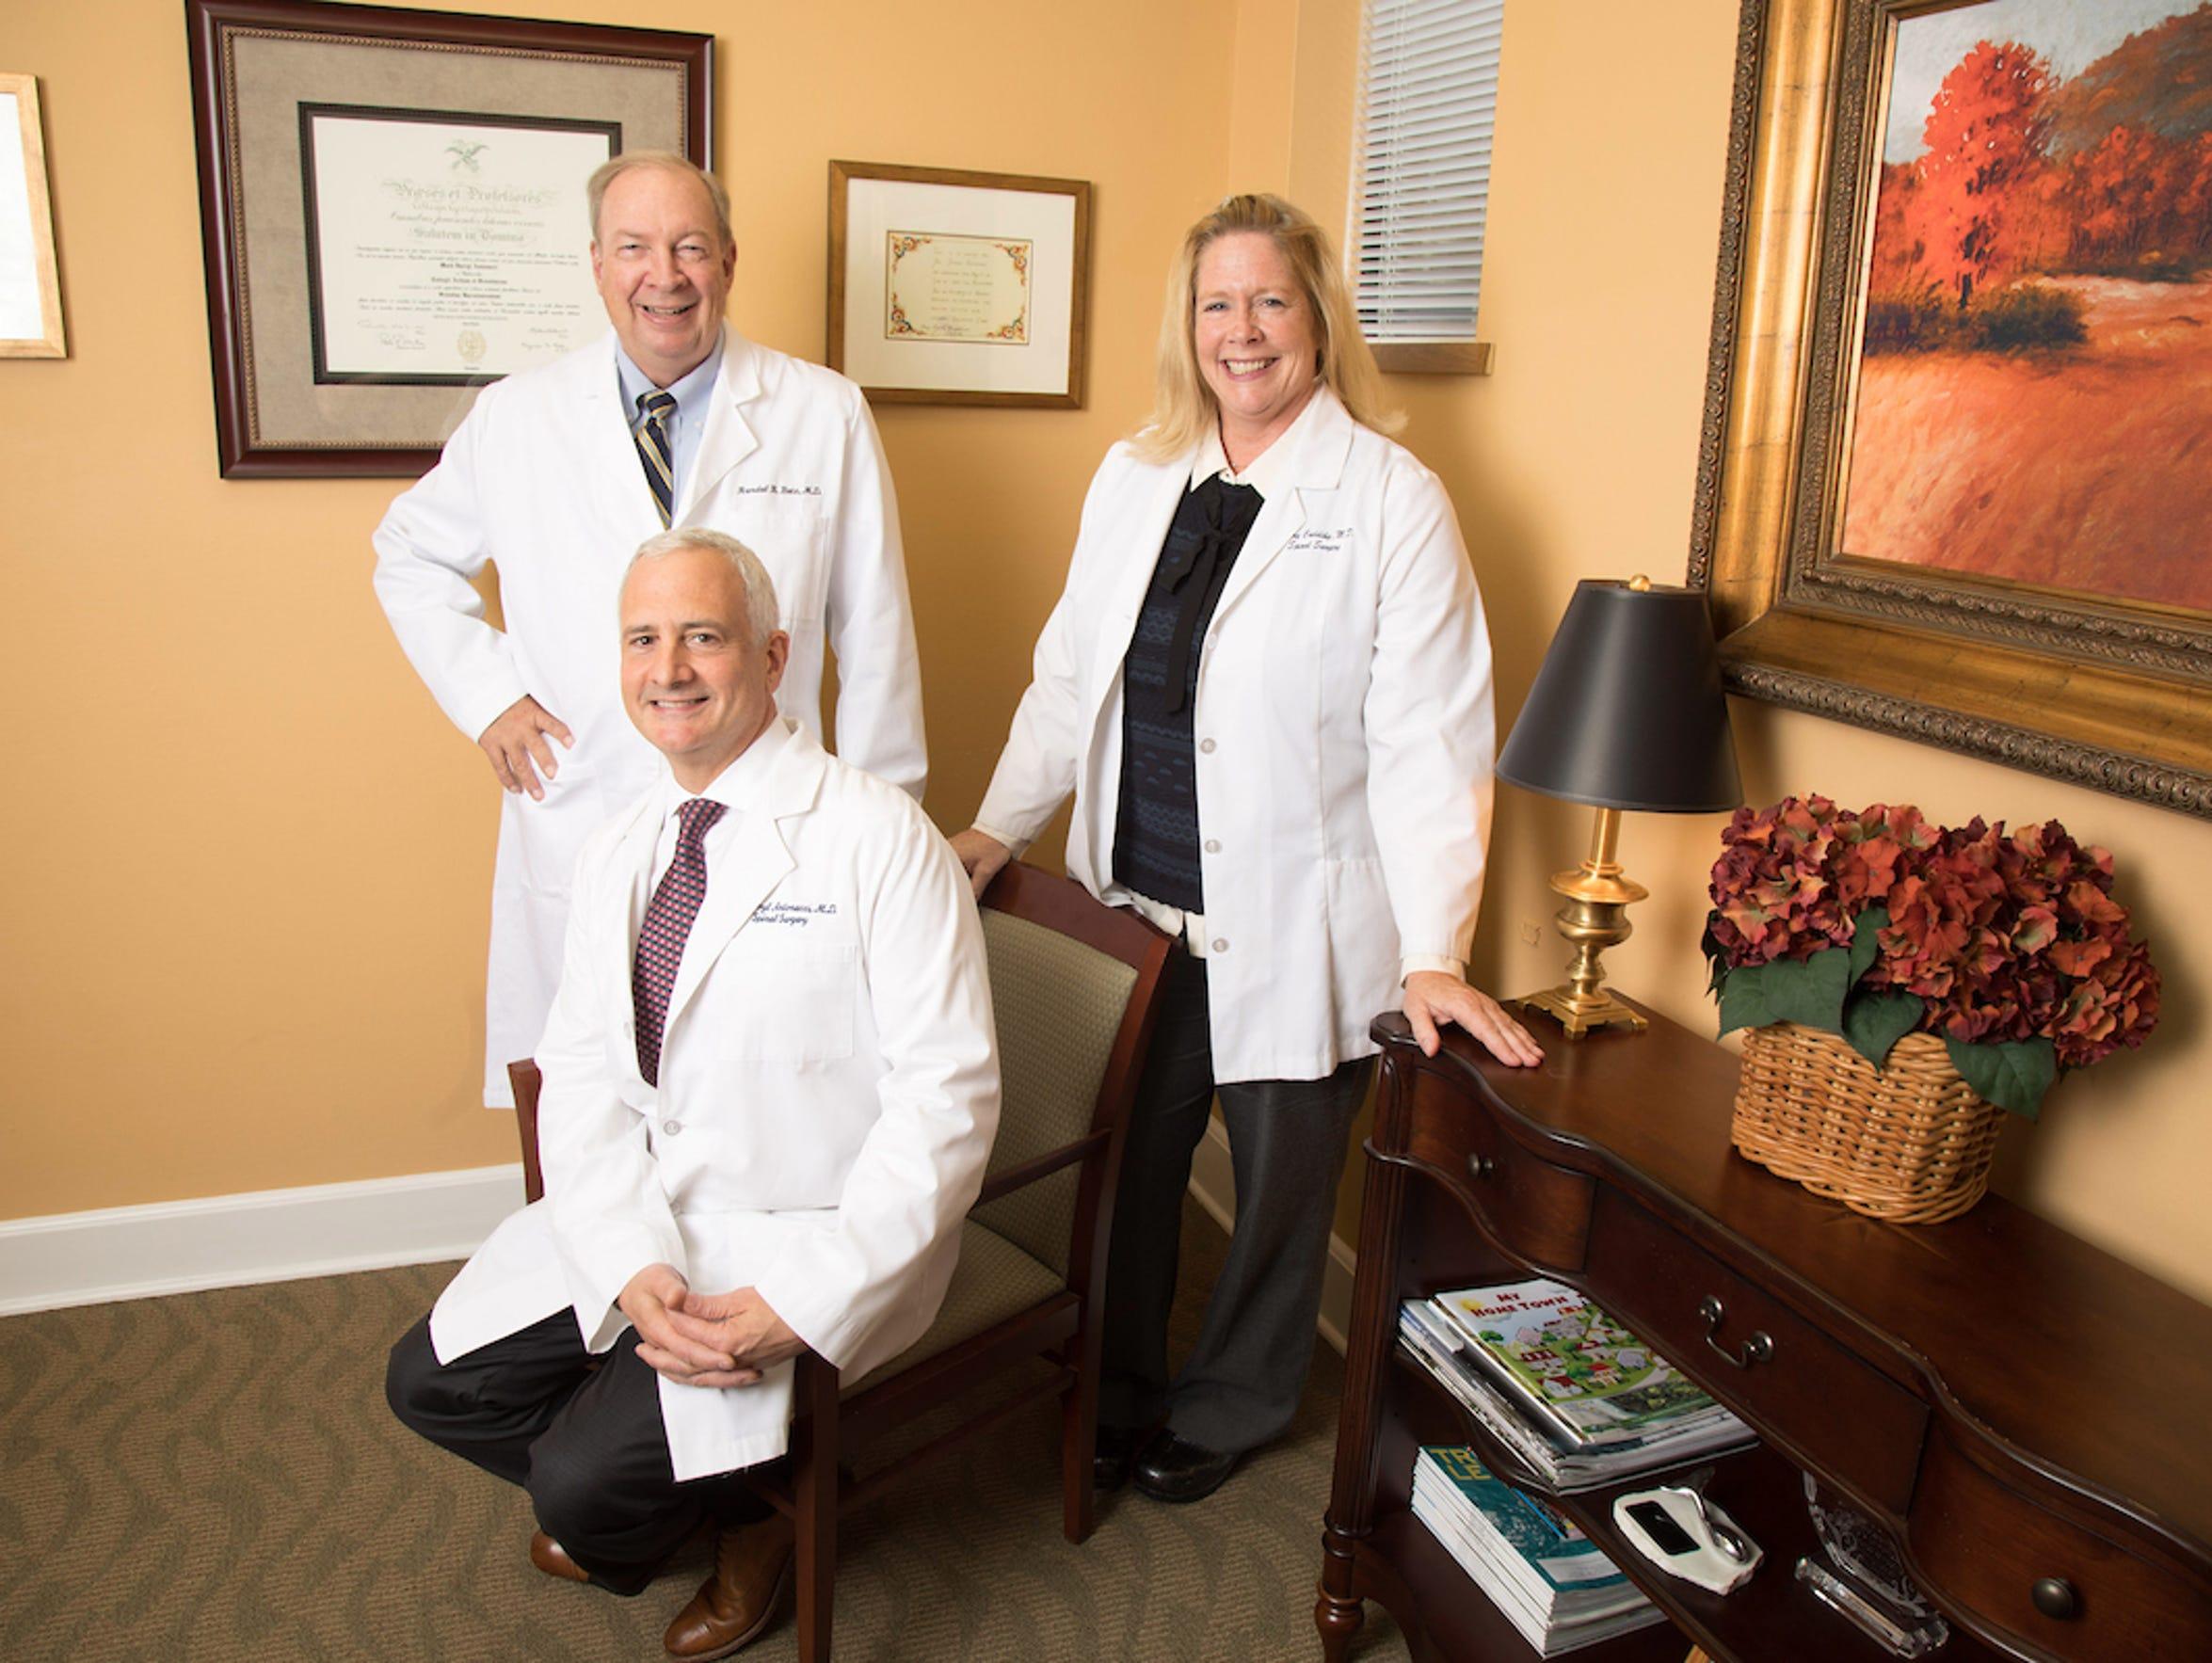 Doctors Darryl Antonacci (seated), Randal R. Betz and